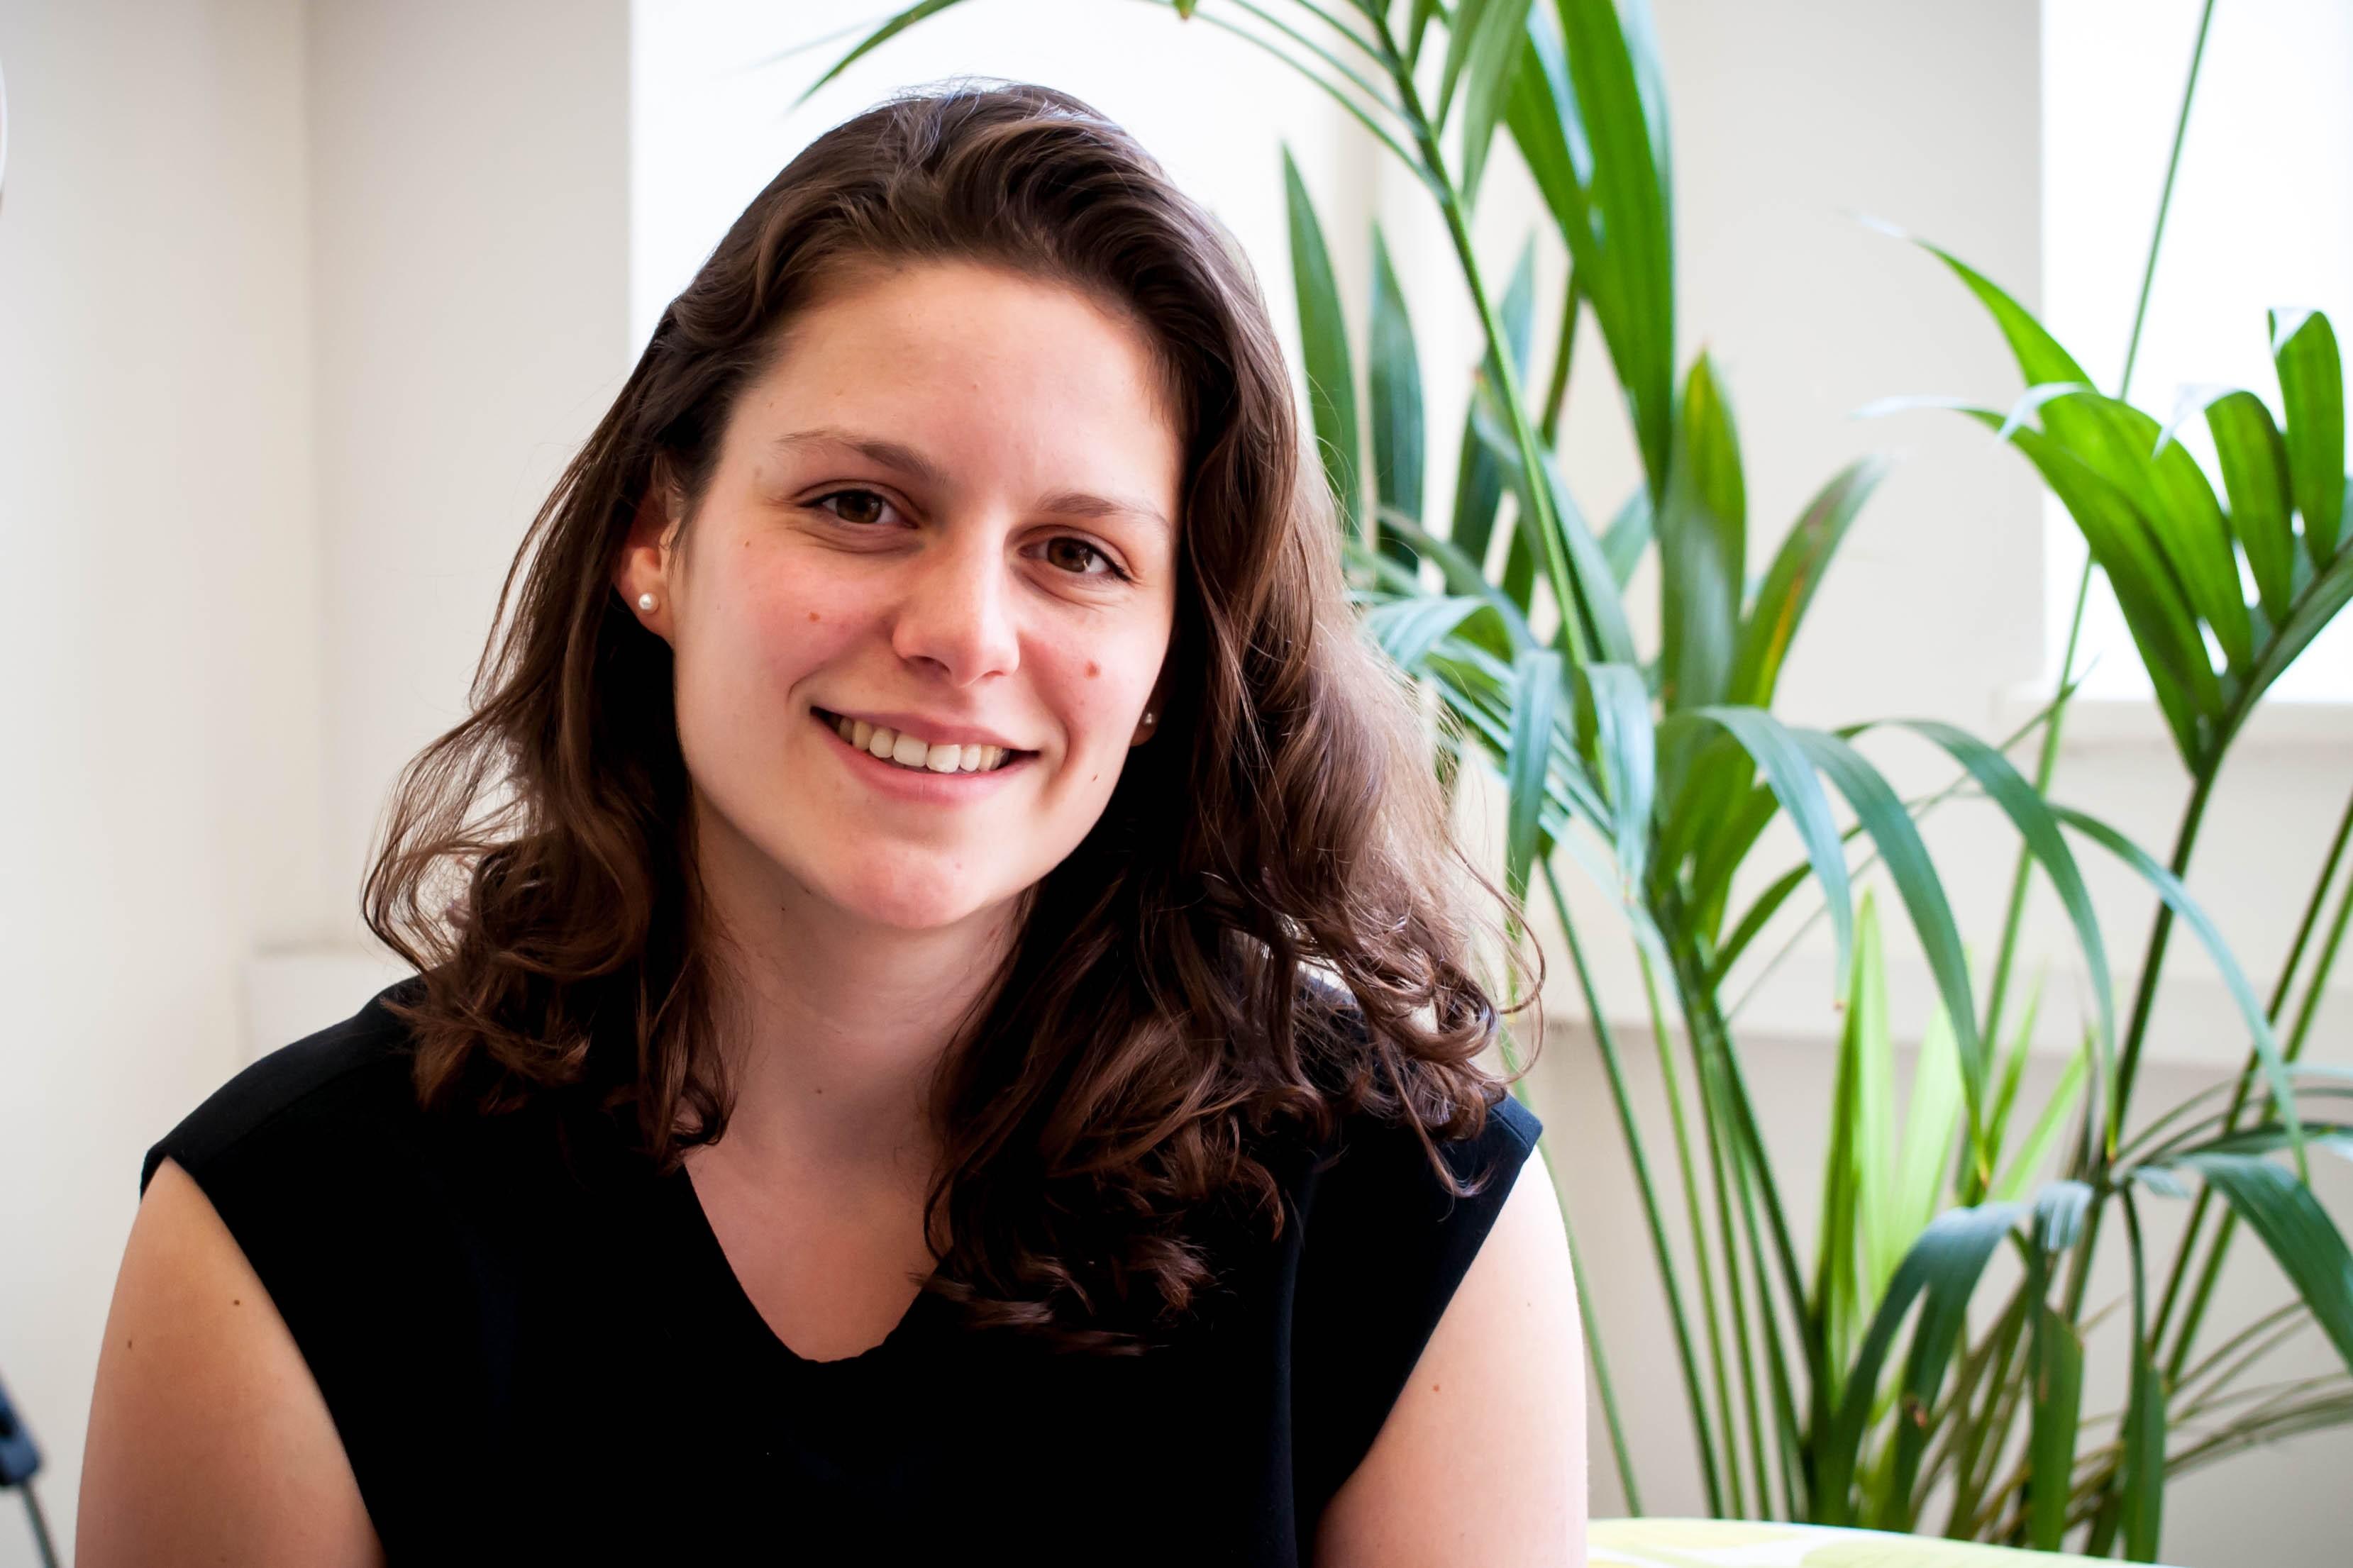 Olivia Beecham young trustee